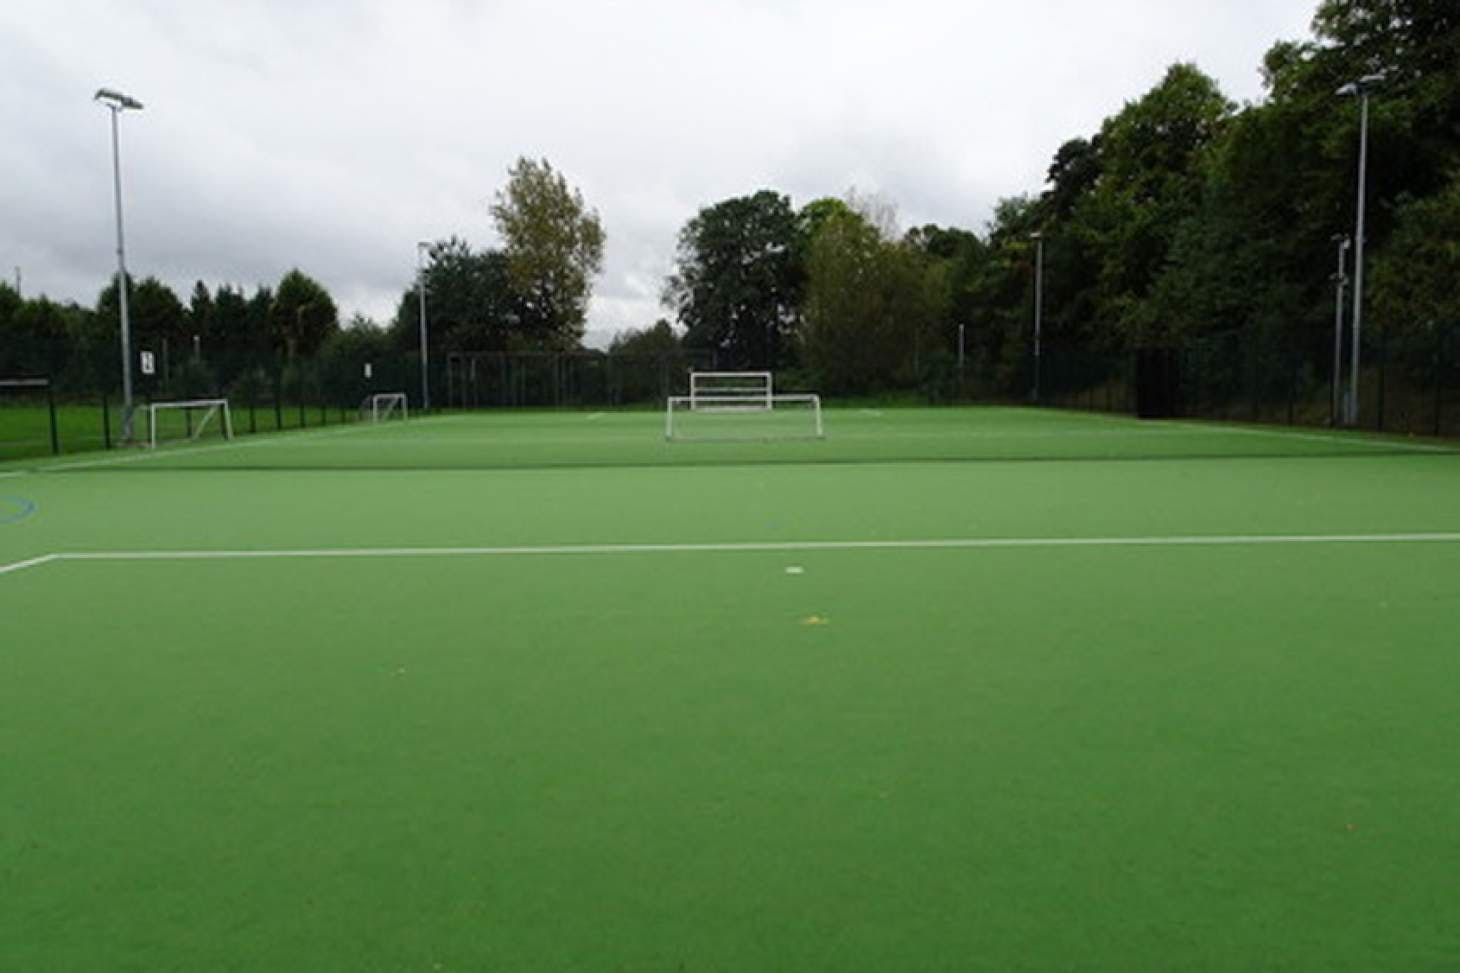 The Barlow RC High School 9 a side | Astroturf football pitch